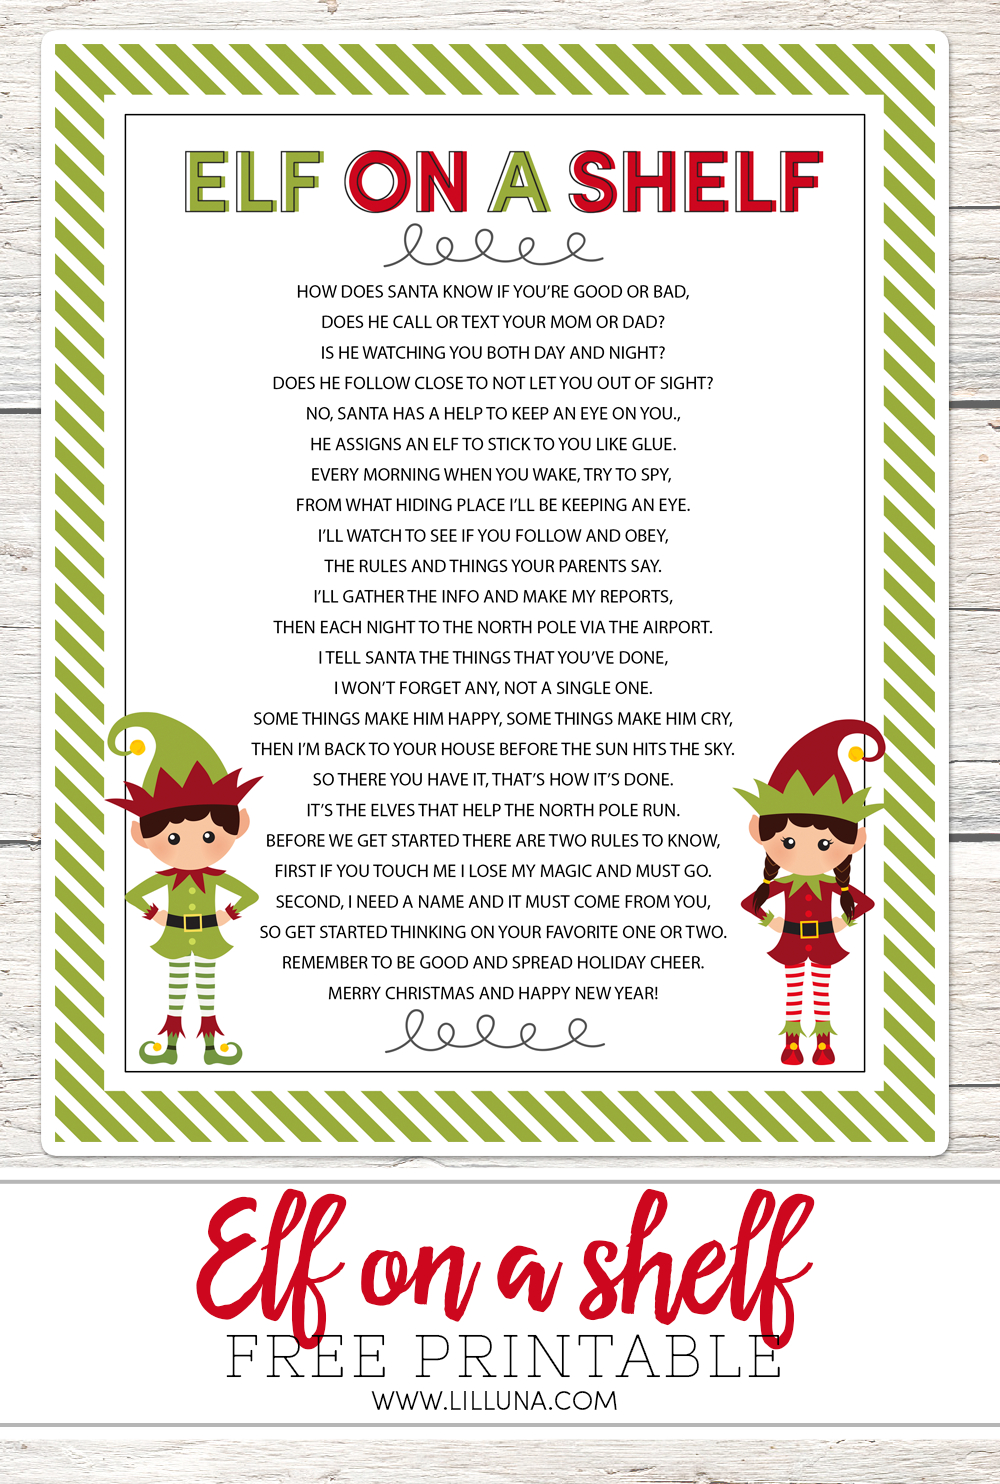 Elf On The Shelf Story - Free Printable Poem - Lil' Luna - Free Printable Elf On The Shelf Story